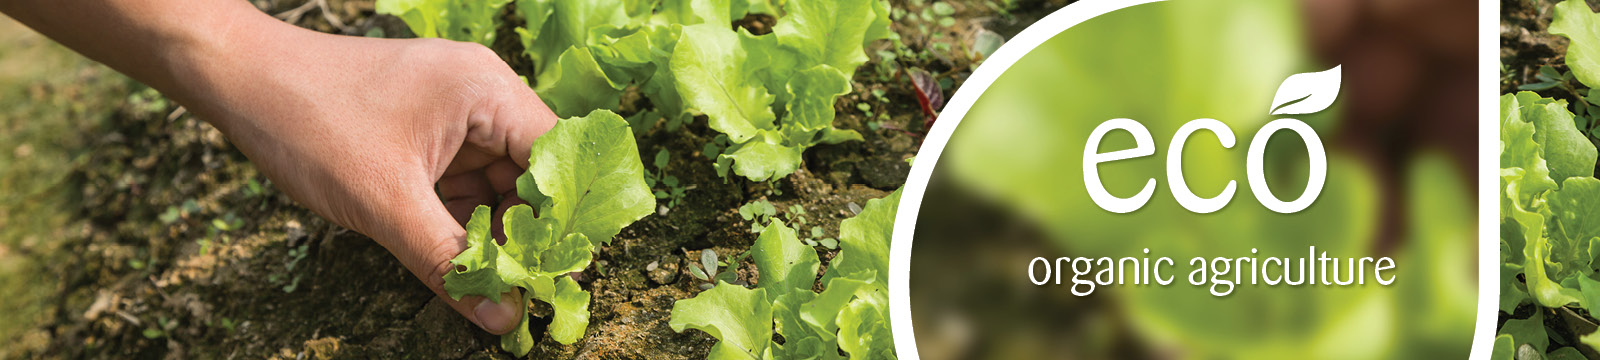 Ekologinis žemės ūkis